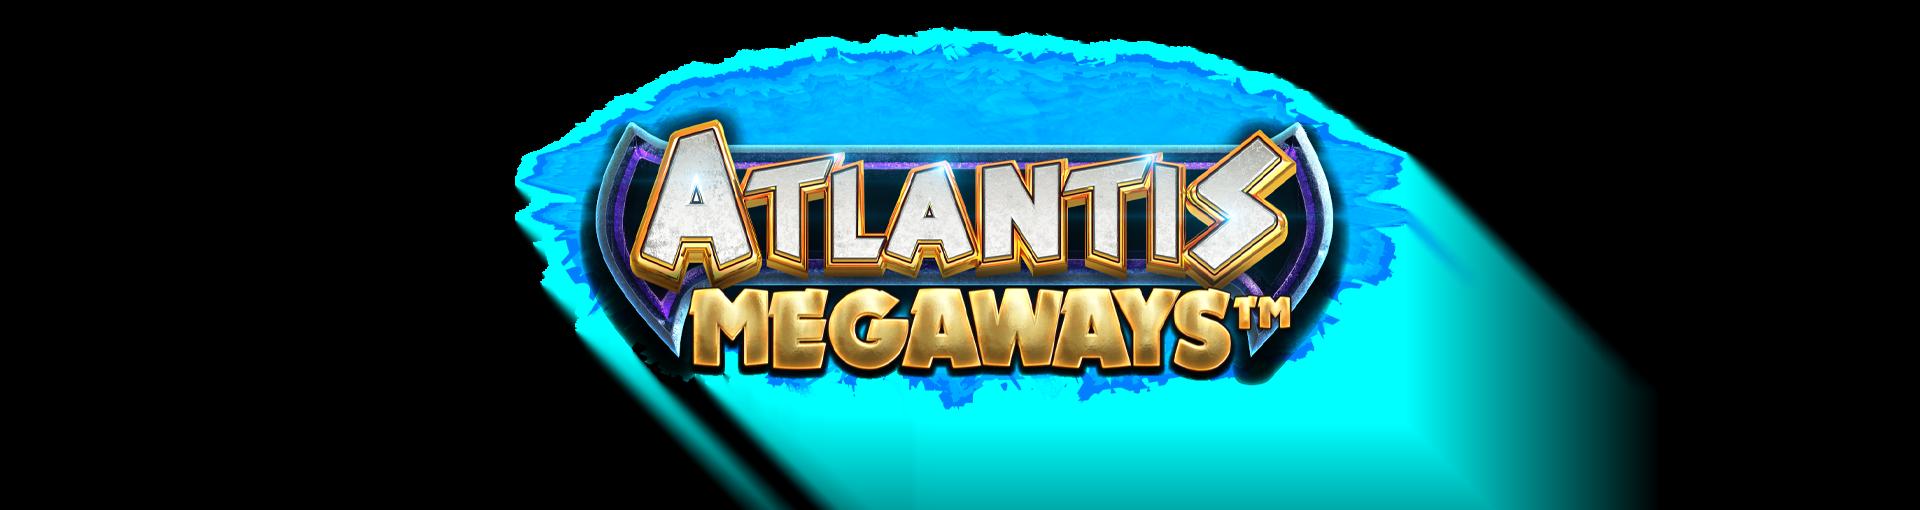 atlantis-Yggdrasil-UpcomingGame-Logo-Template-1920x510px